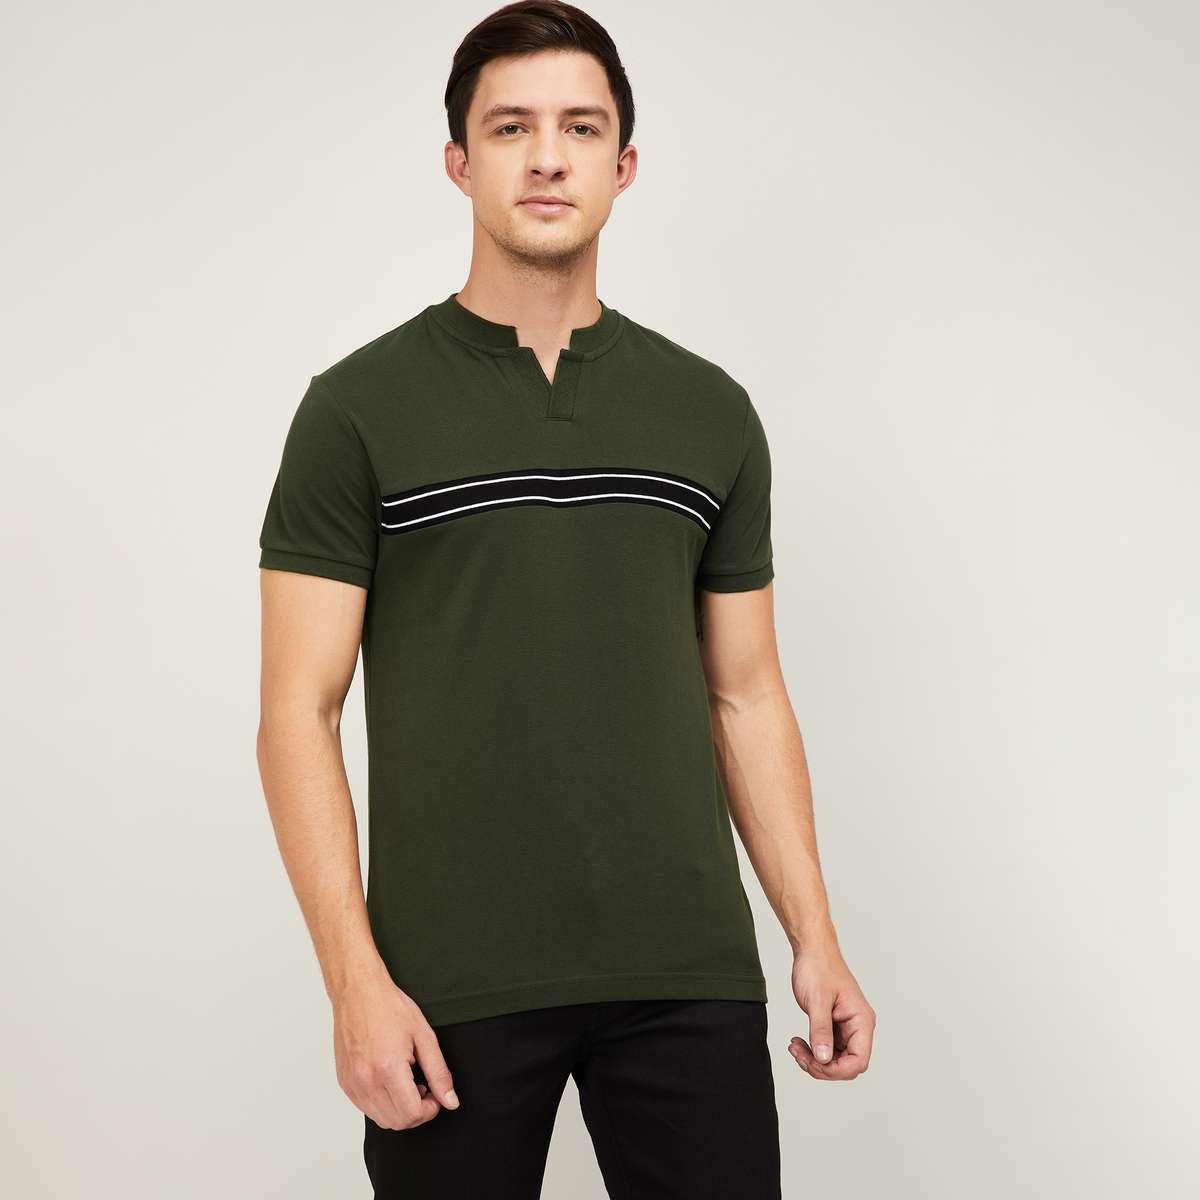 DENIMIZE Men Striped Regular Fit Polo T-shirt